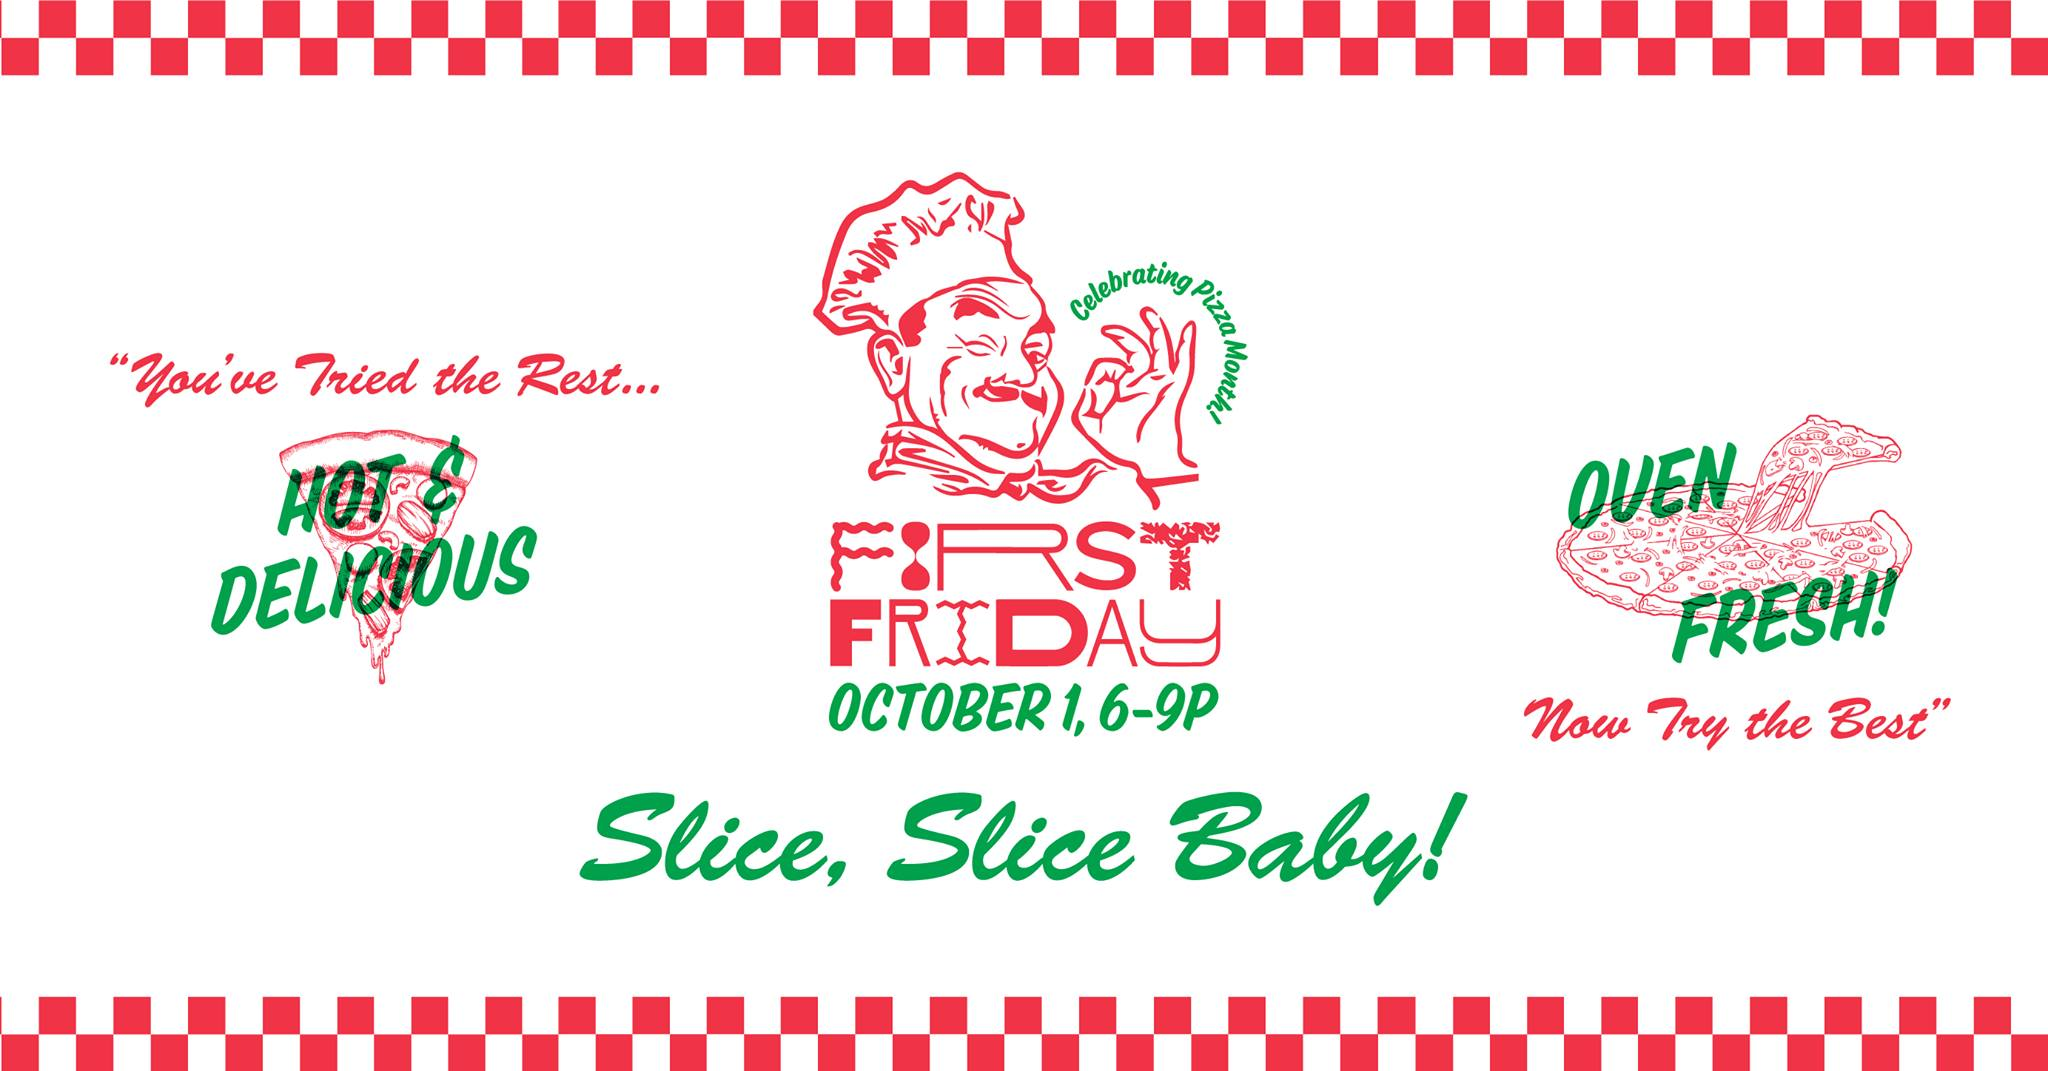 First Friday Slice Slice Baby